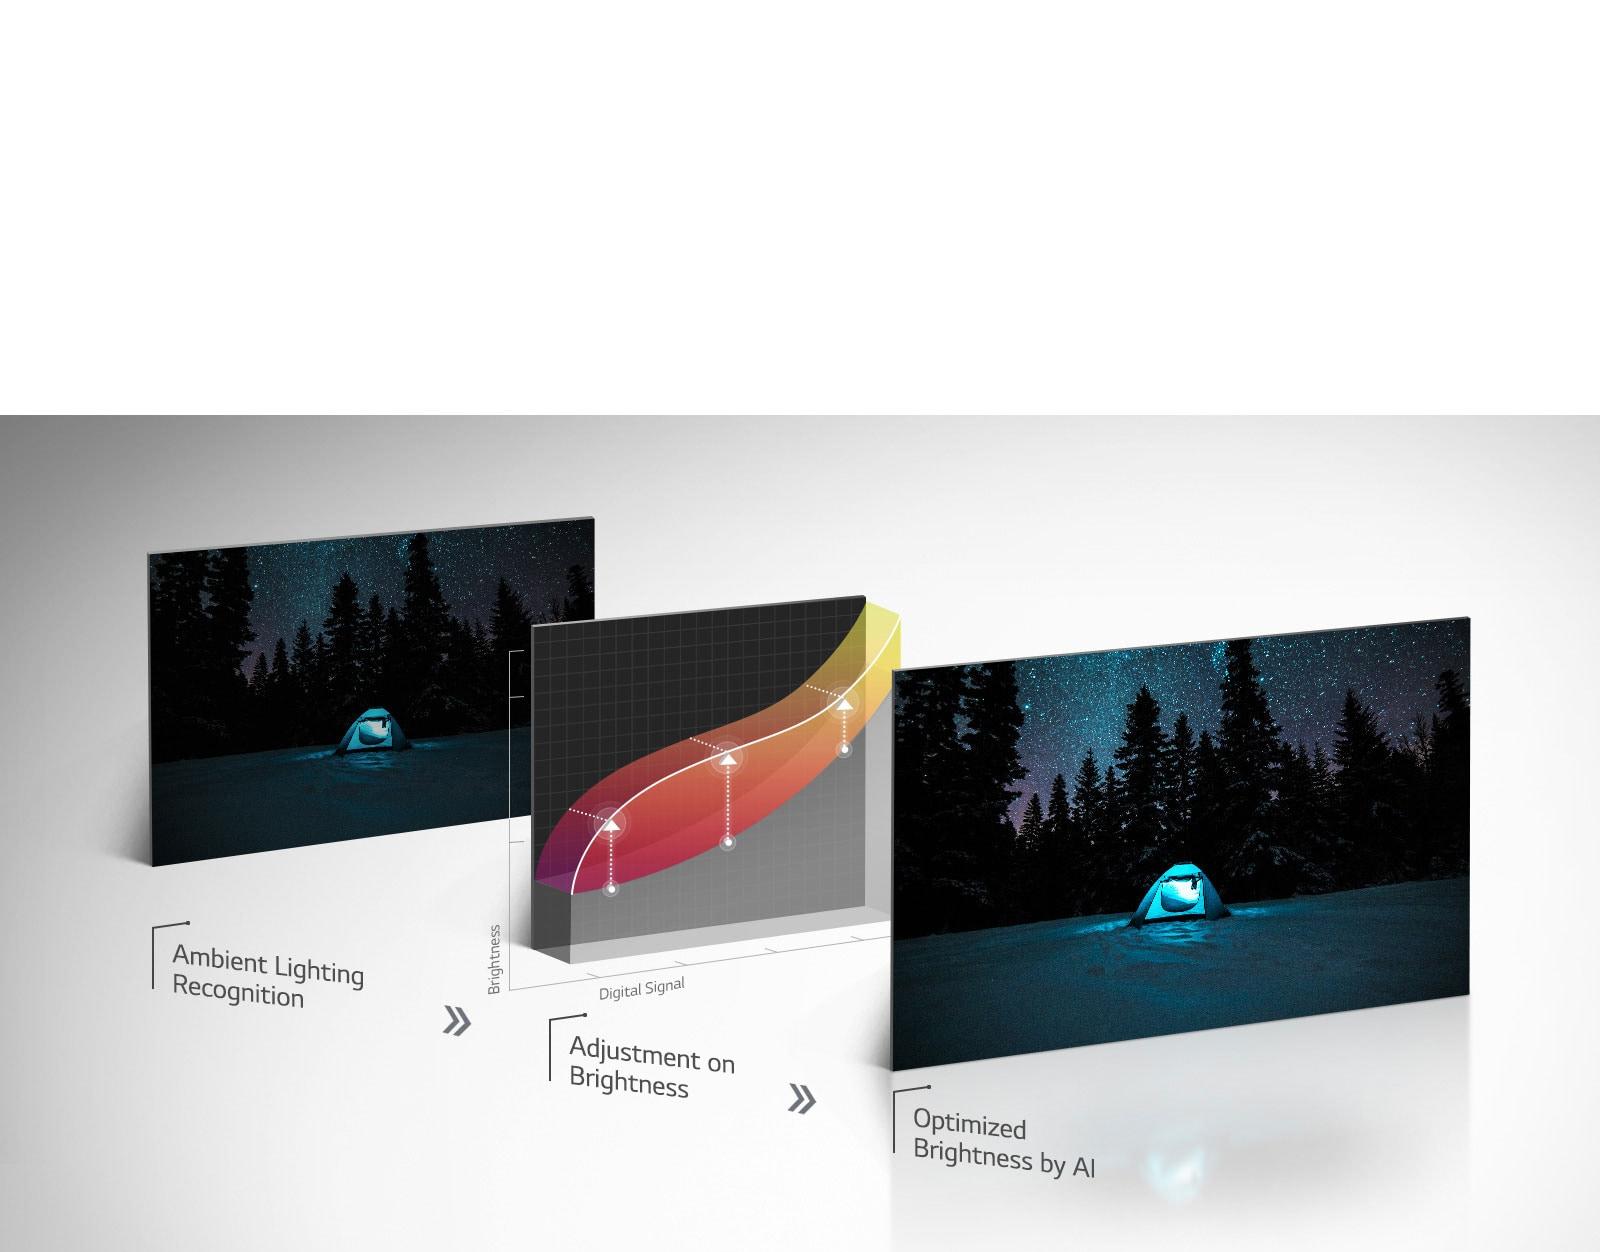 LG AI Brightness Nano Cell TV